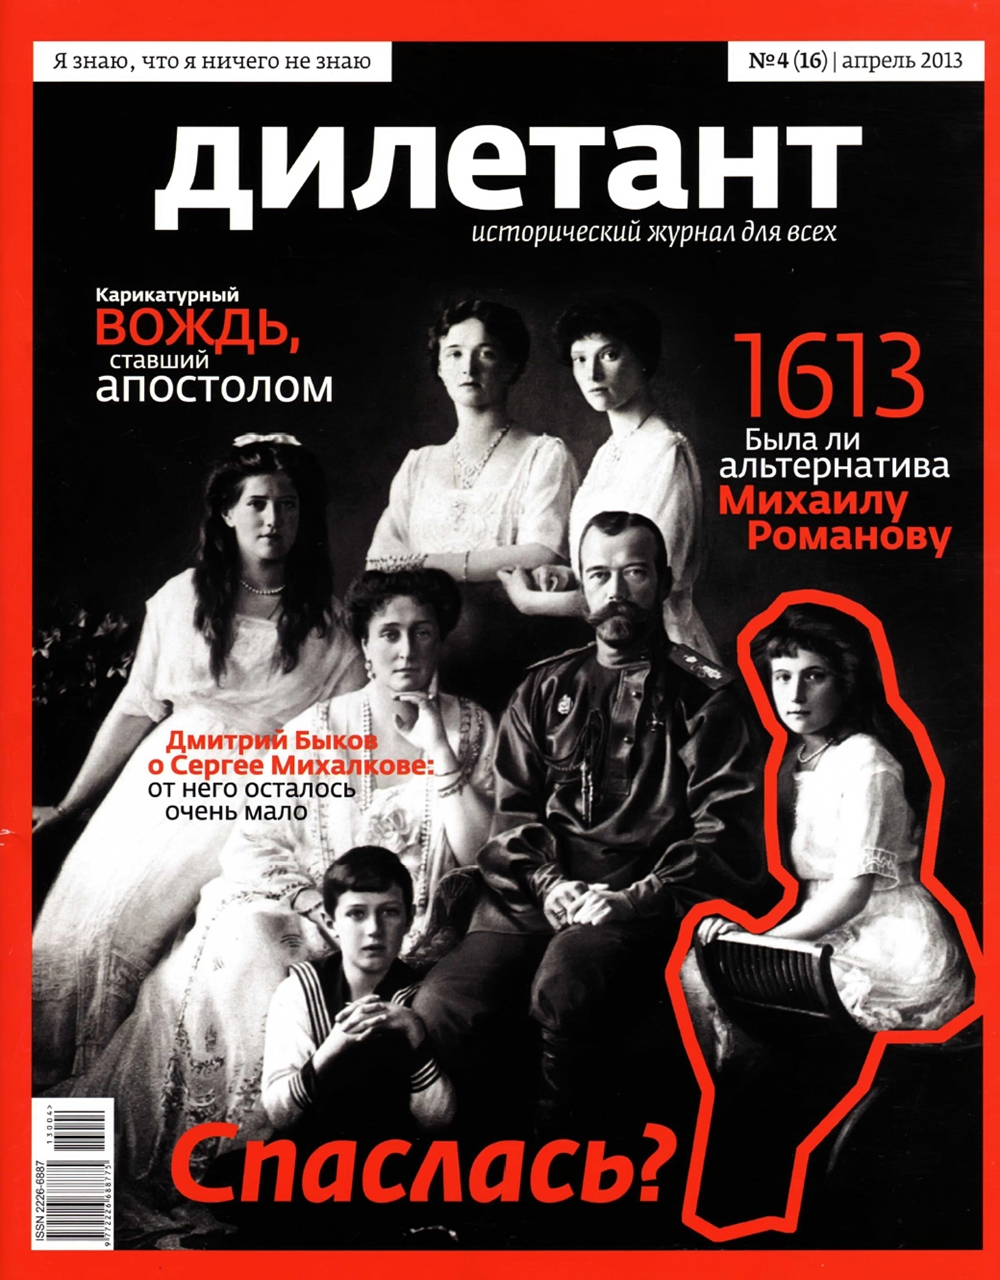 http://images.vfl.ru/ii/1404418292/6b5154d6/5616450.jpg